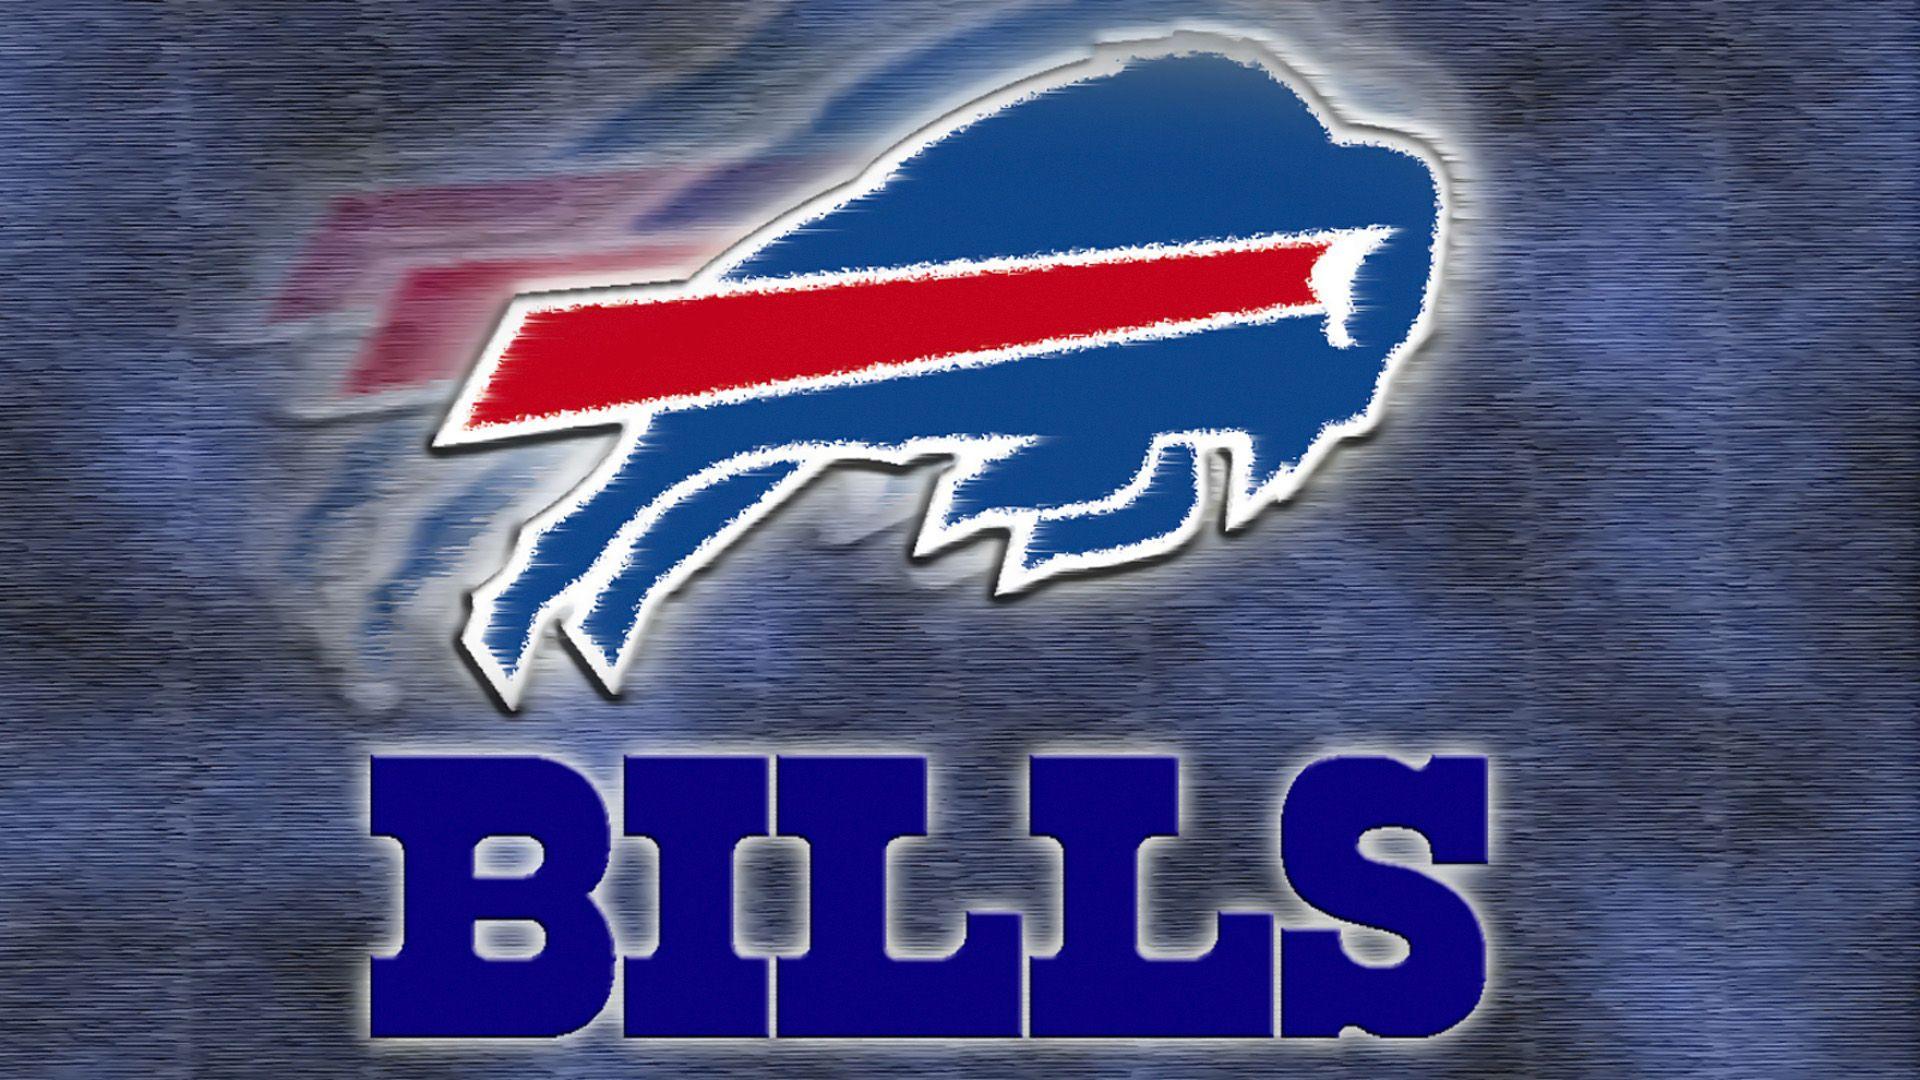 Buffalo Wallpaper And Screensavers Buffalo Bills Screensavers Logo Screensaver 155937 Buffalo Bills Logo Nfl Buffalo Bills Buffalo Bills Memes